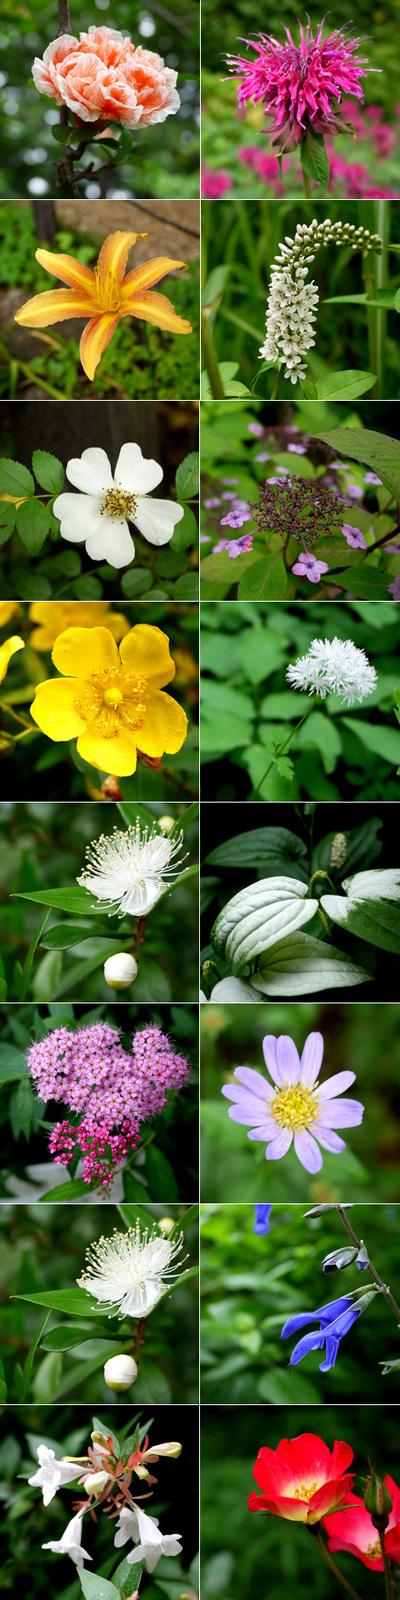 Flowers201106